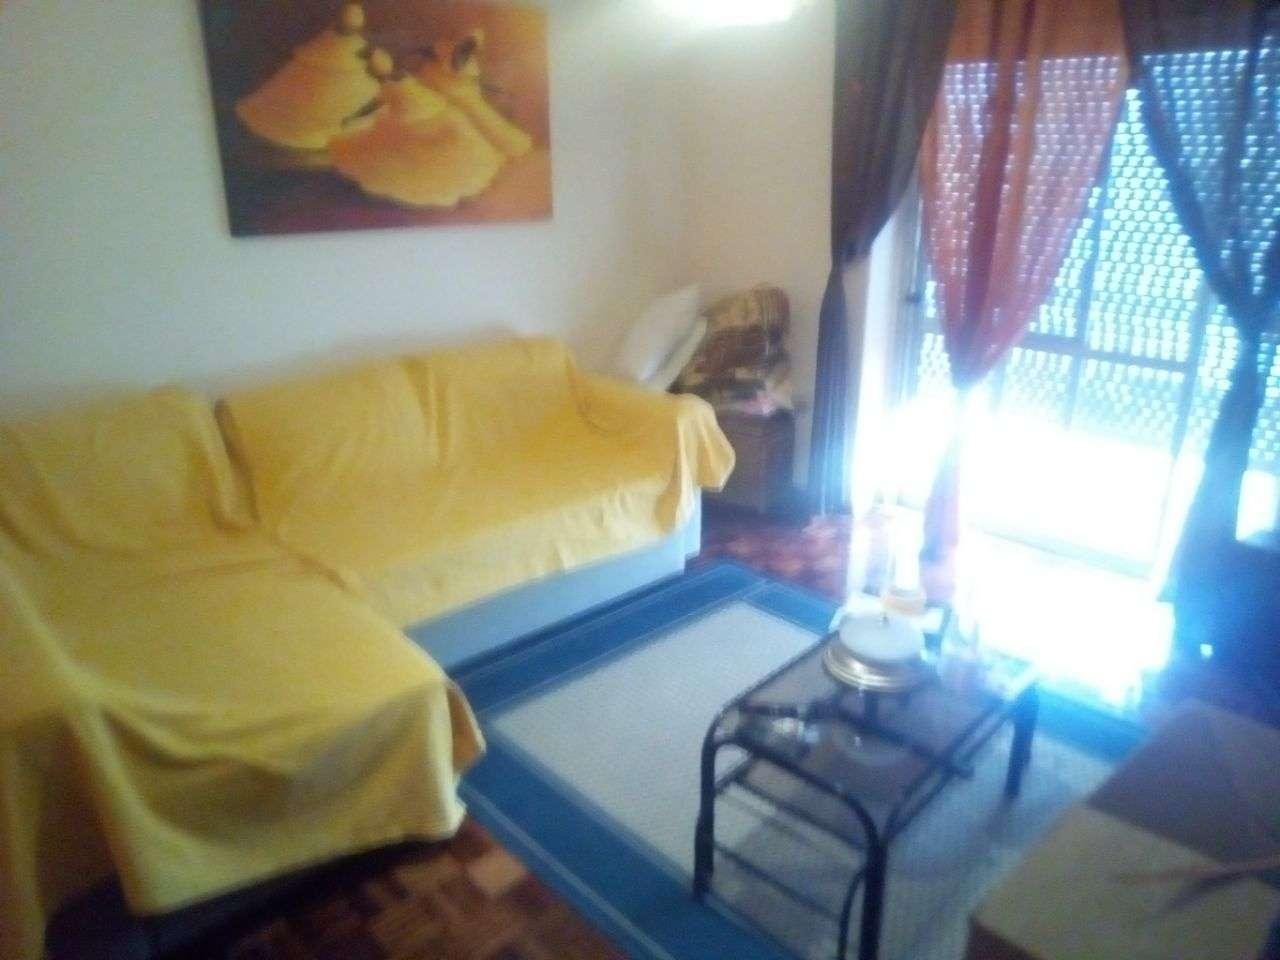 Apartamento para comprar, Rio de Mouro, Sintra, Lisboa - Foto 2